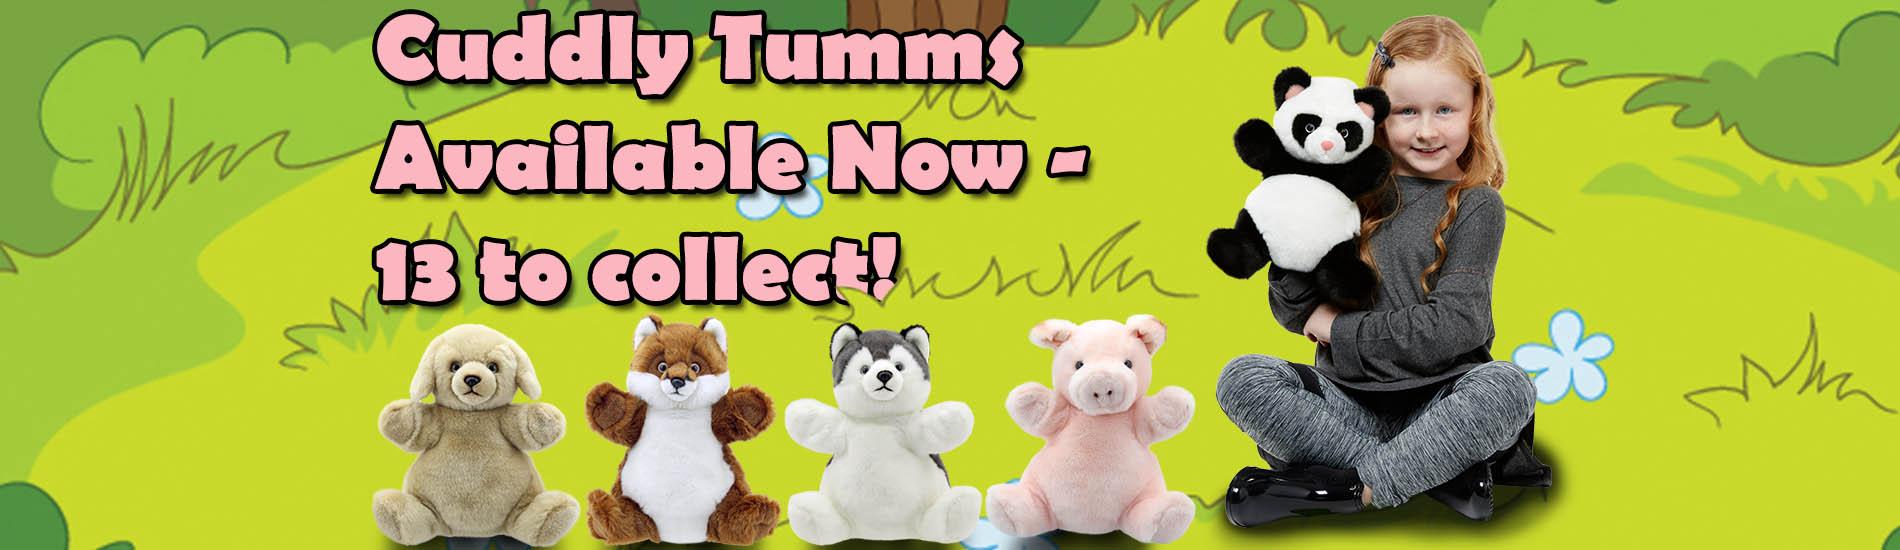 Main-Banner-Cuddly-Tumms-New-2